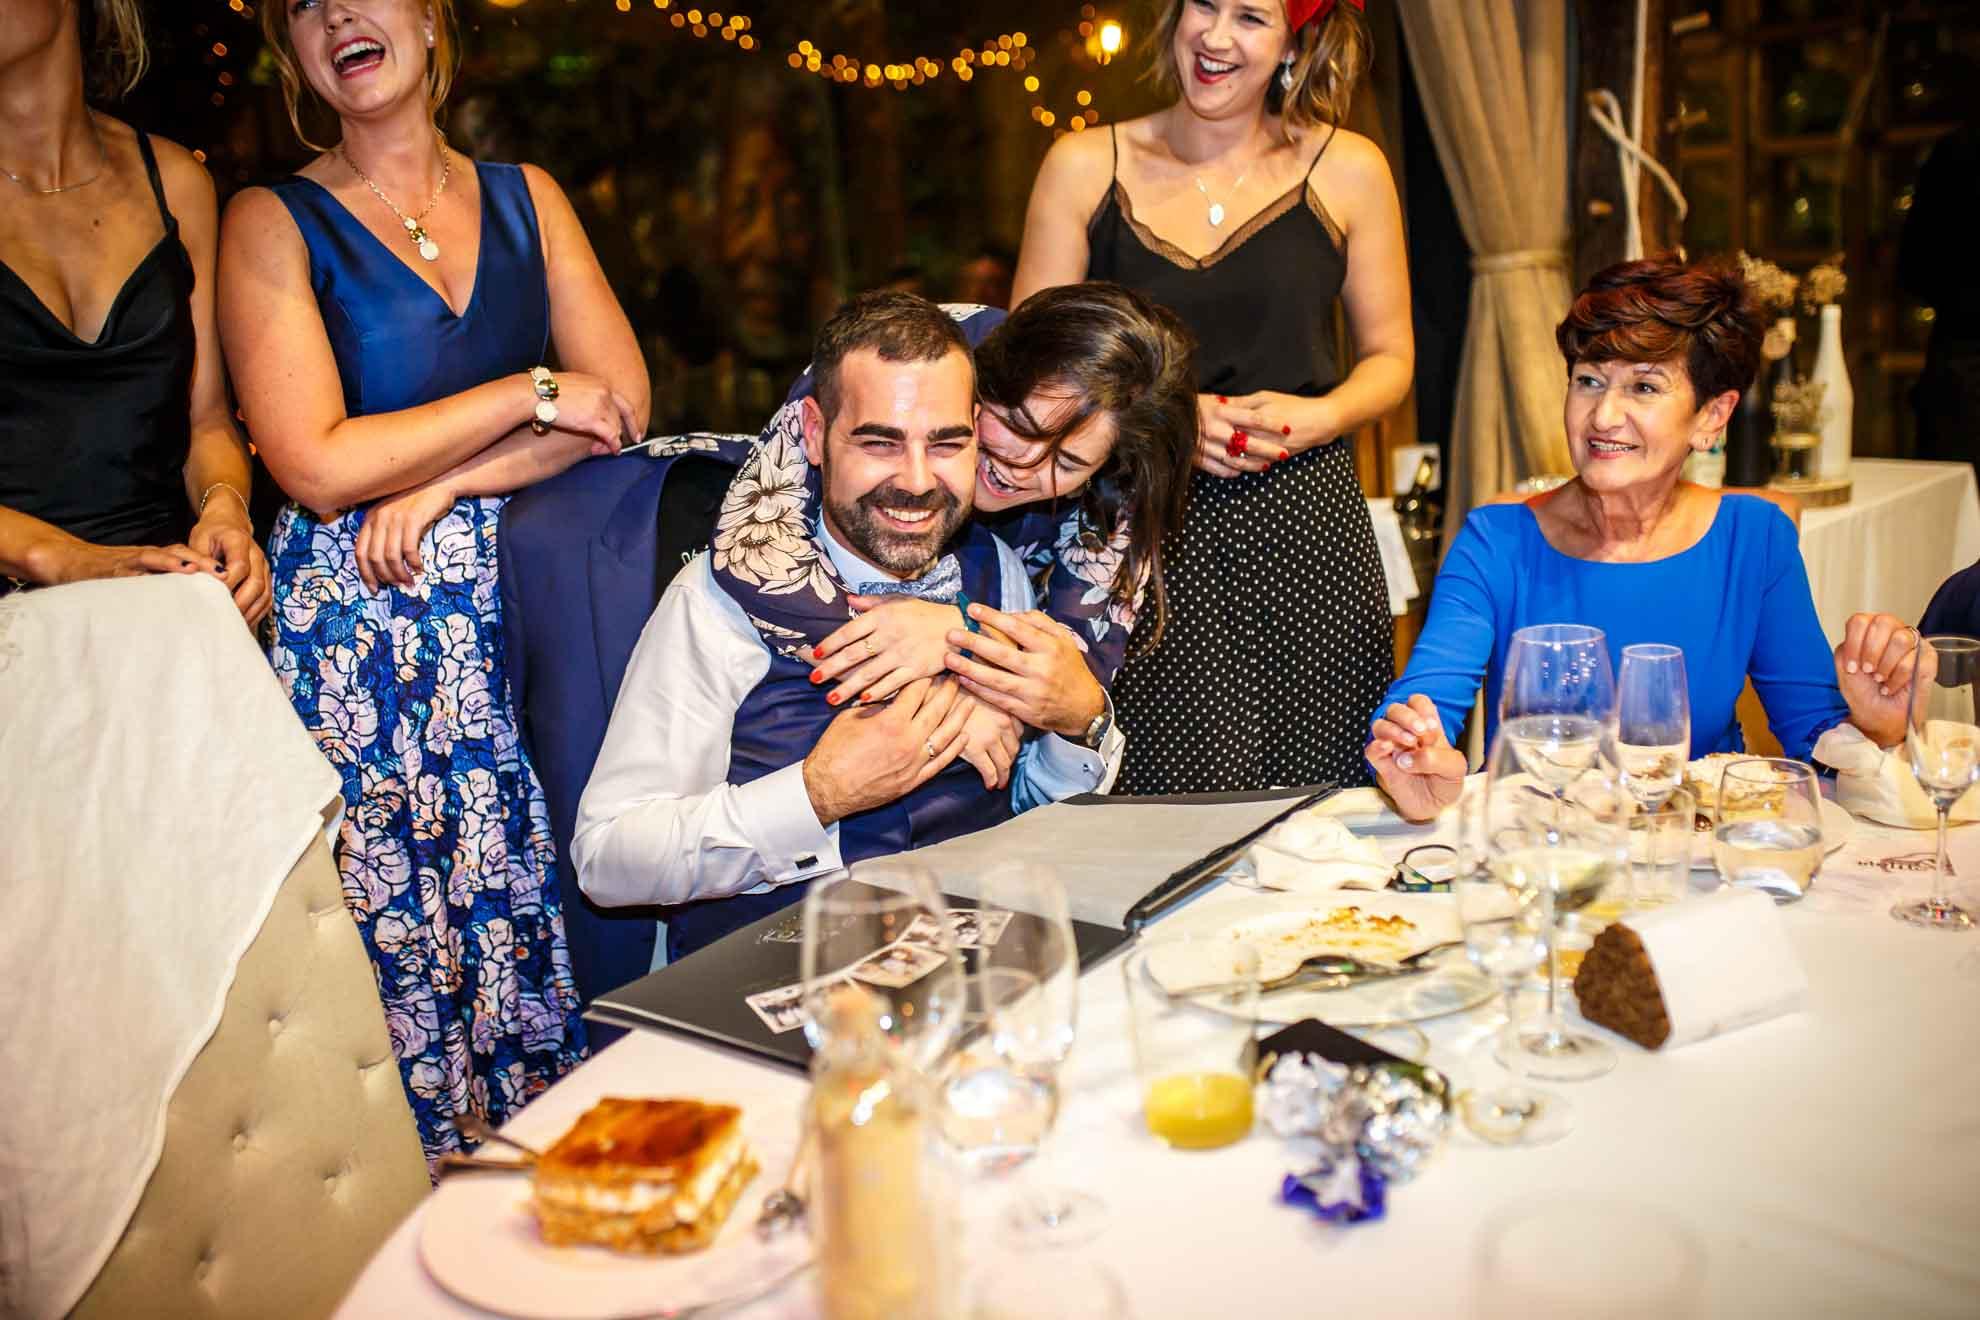 abrazo al novio en el restaurante araeta